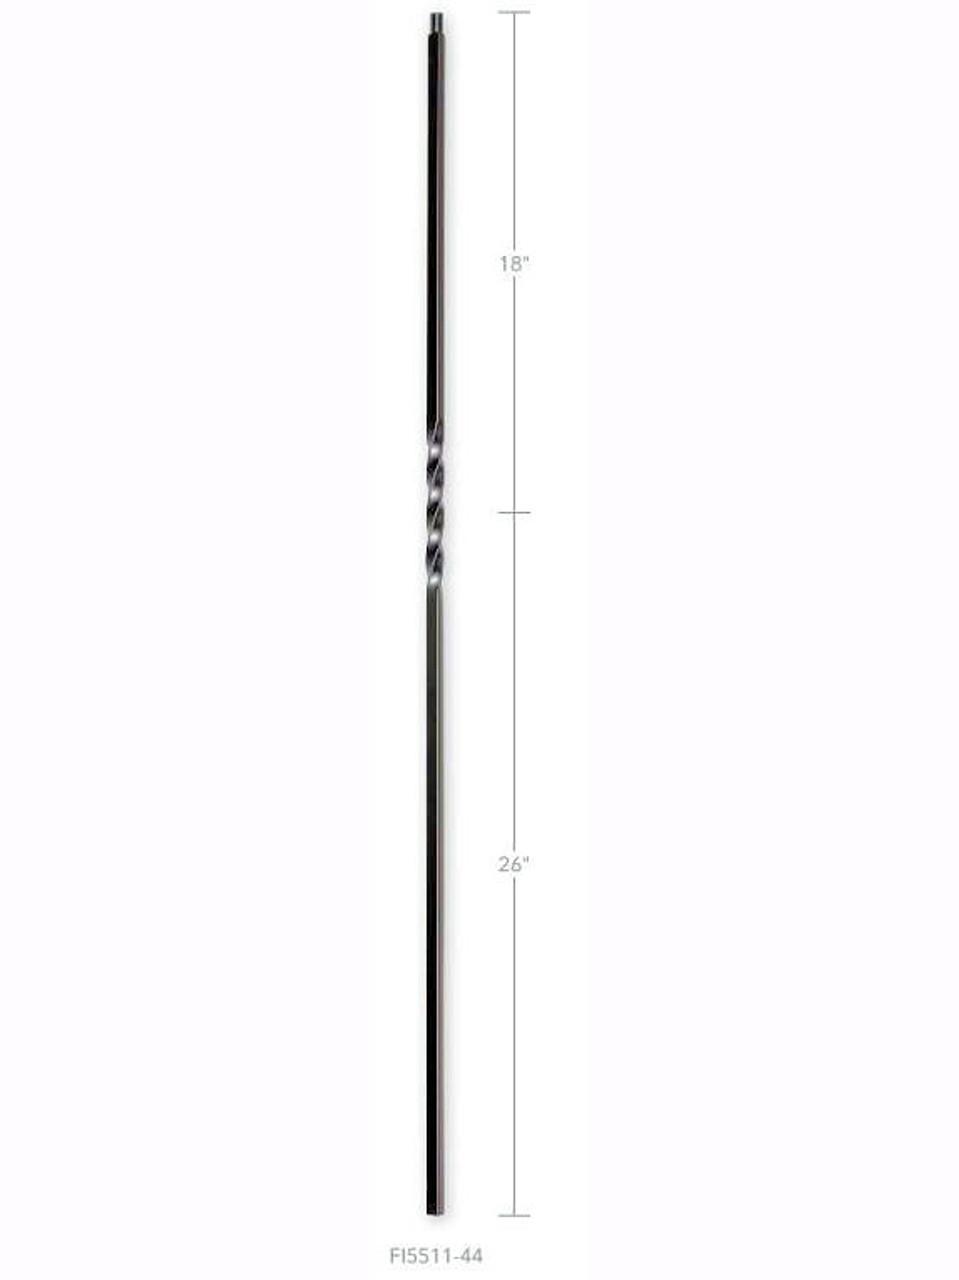 FIH5511-44 Hollow Single Twist Iron Baluster